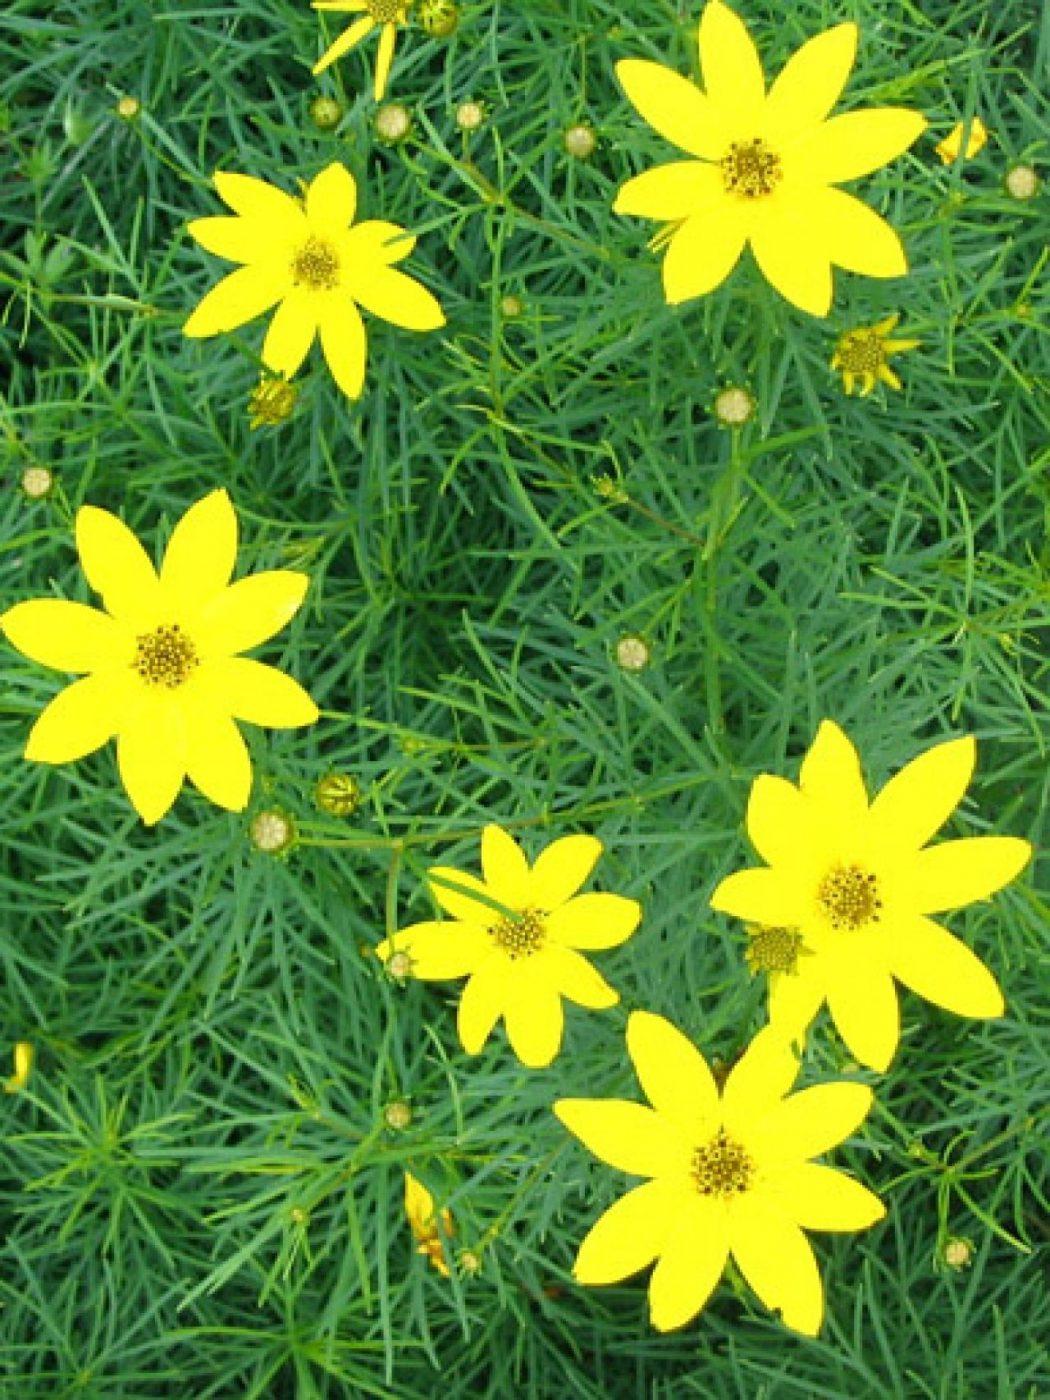 coreopsis.jpg.rend_.hgtvcom.1280.1707 Top 10 Flowers That Bloom all Year